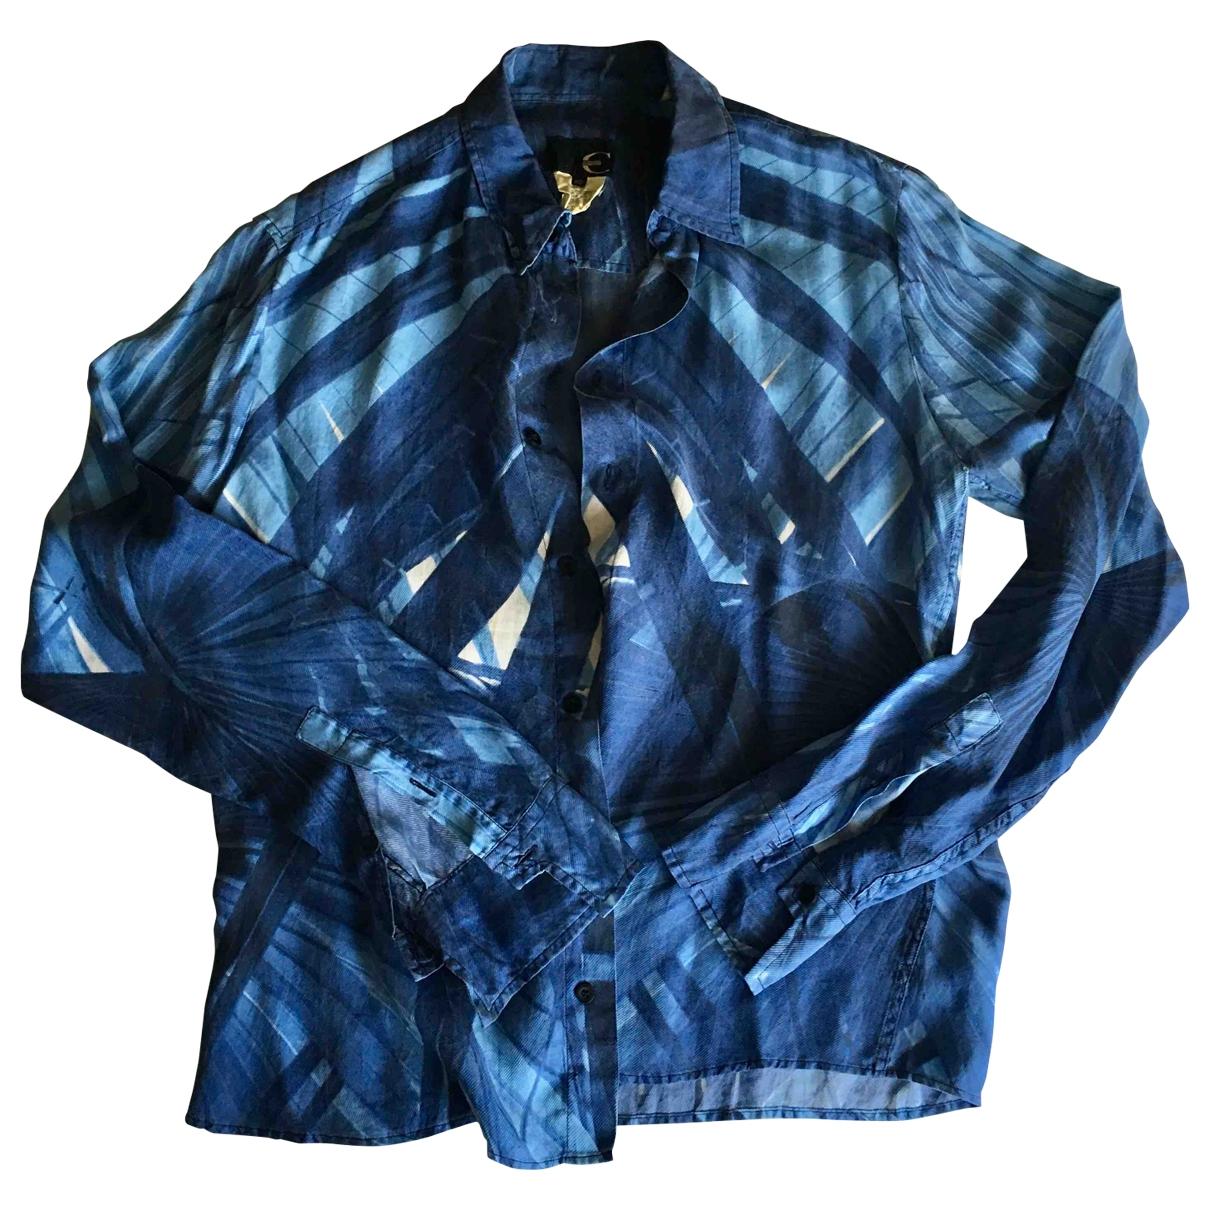 Camisas de Seda Just Cavalli